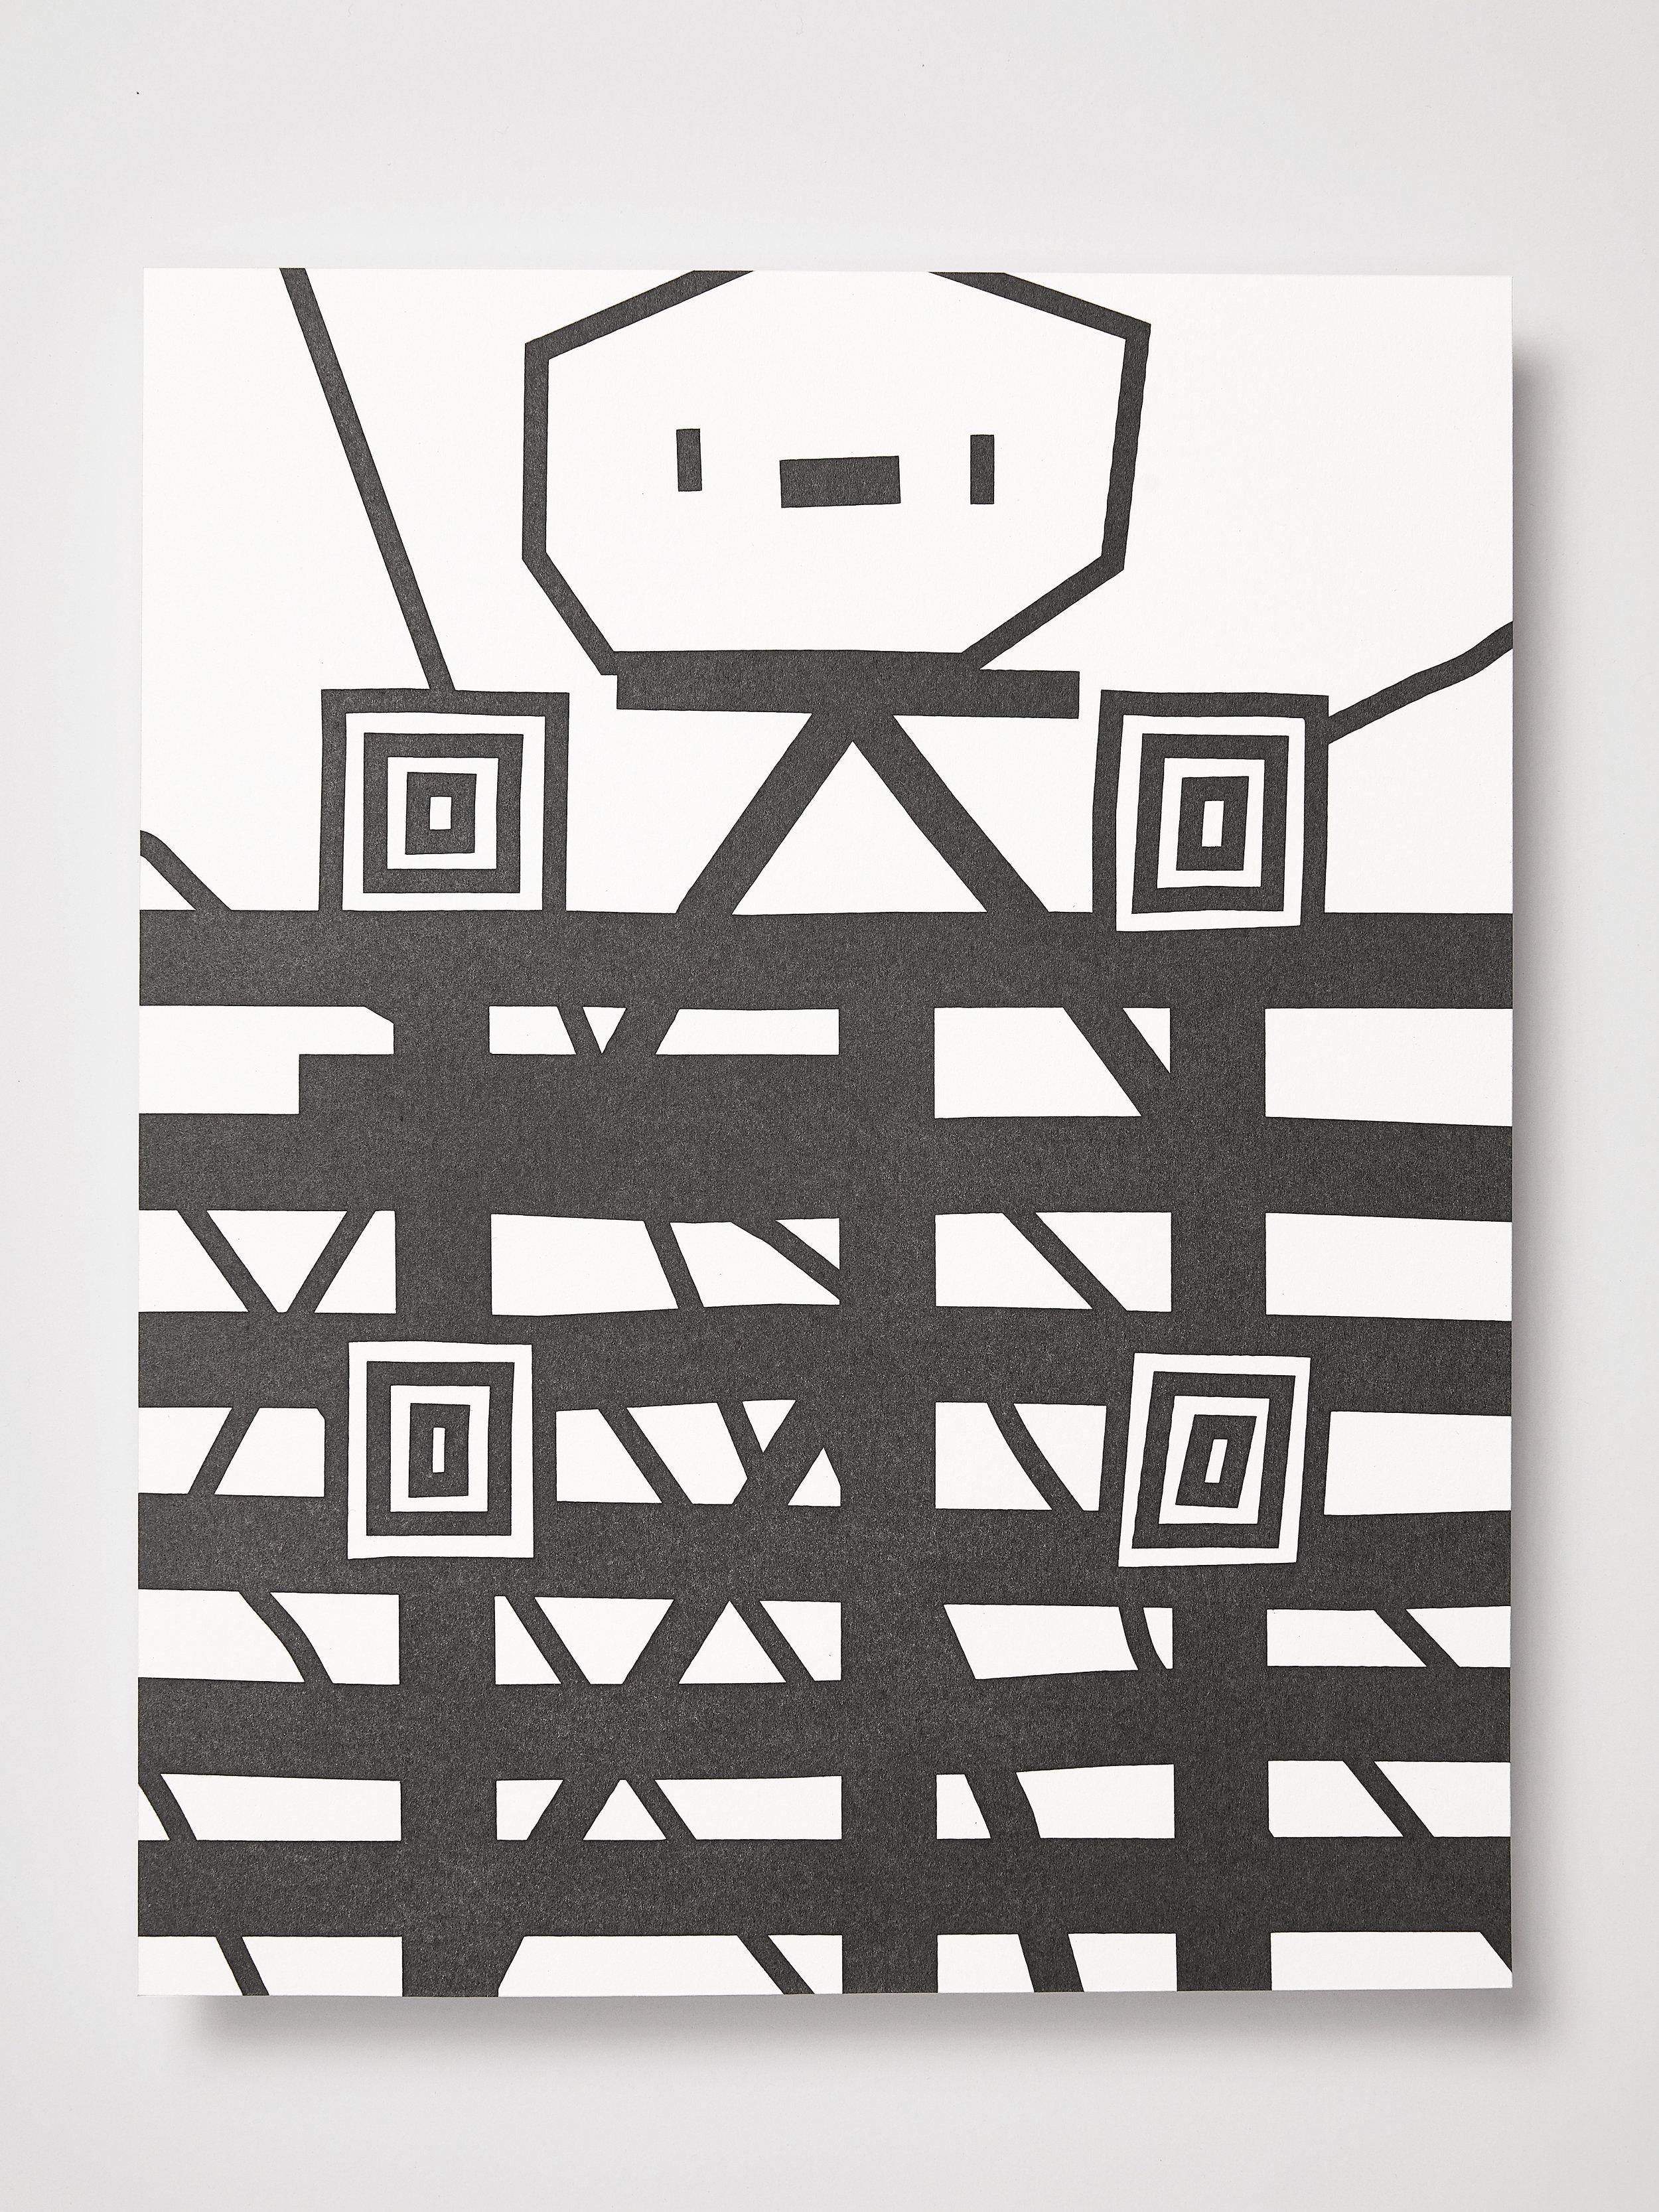 Sean Talley, sup3rMind45, 2018.  Graphite powder on paper. 8 x 10 inches.